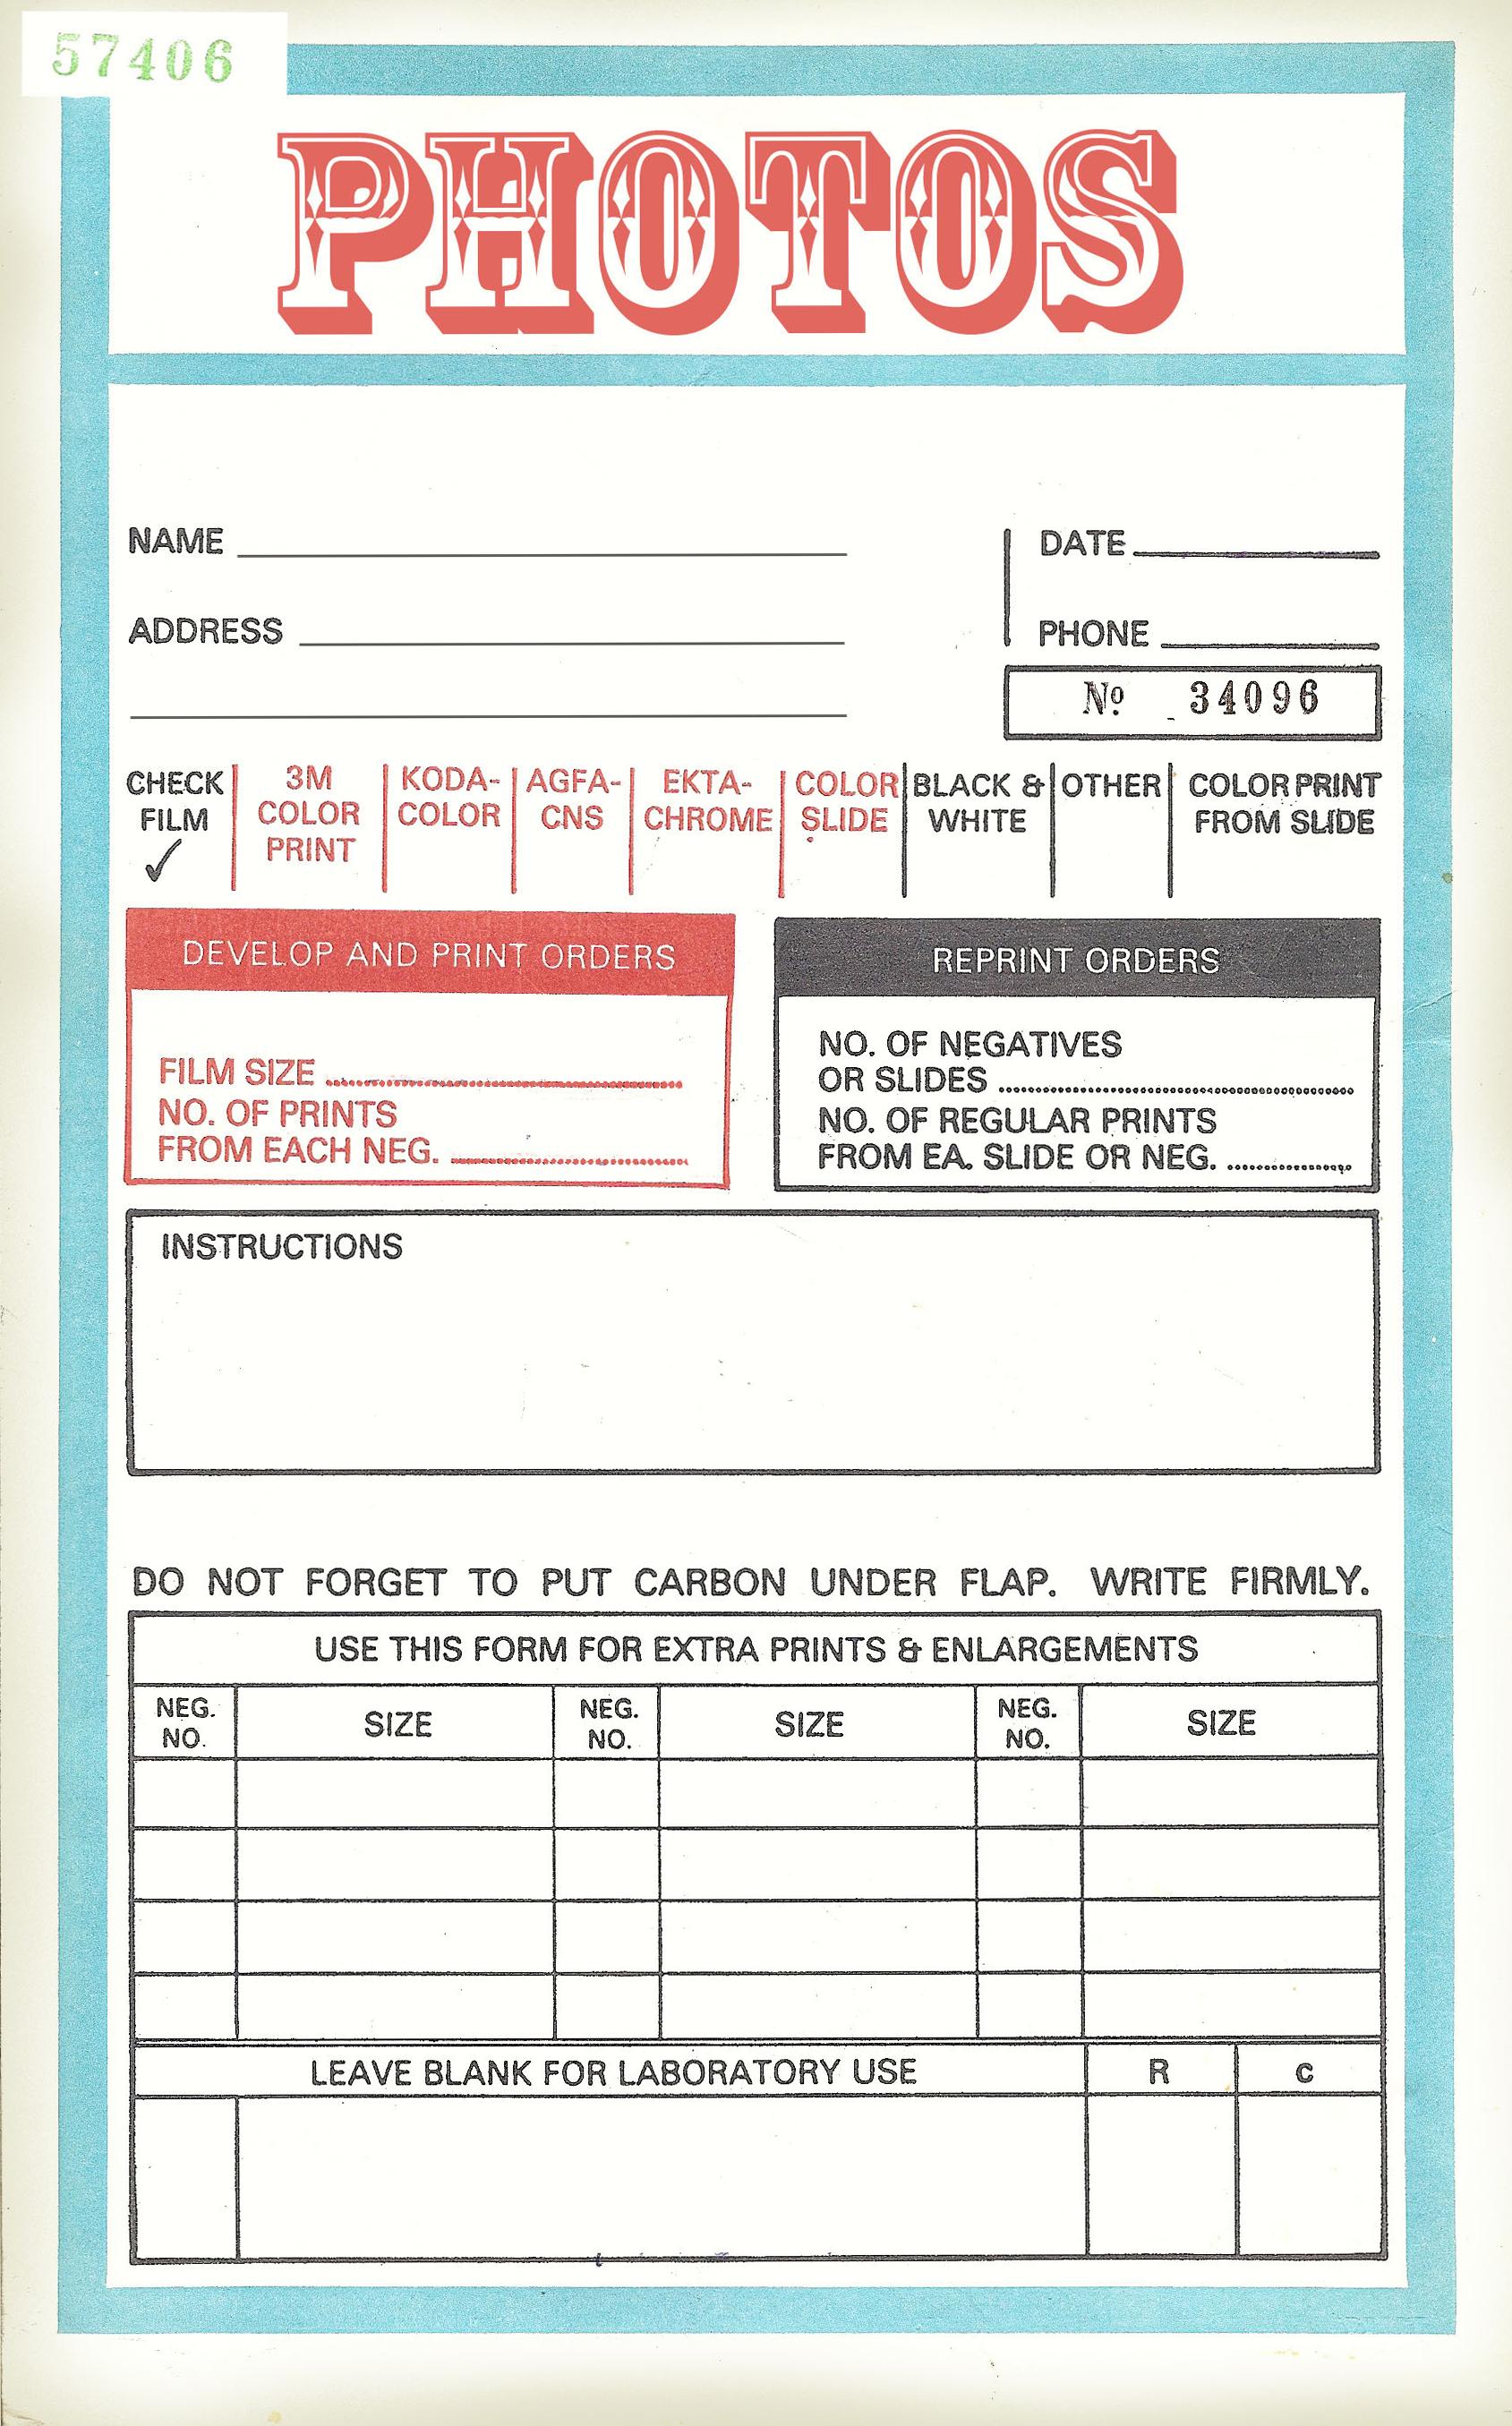 Free Printable Photo Envelope Edited To Fix A Typographical Error